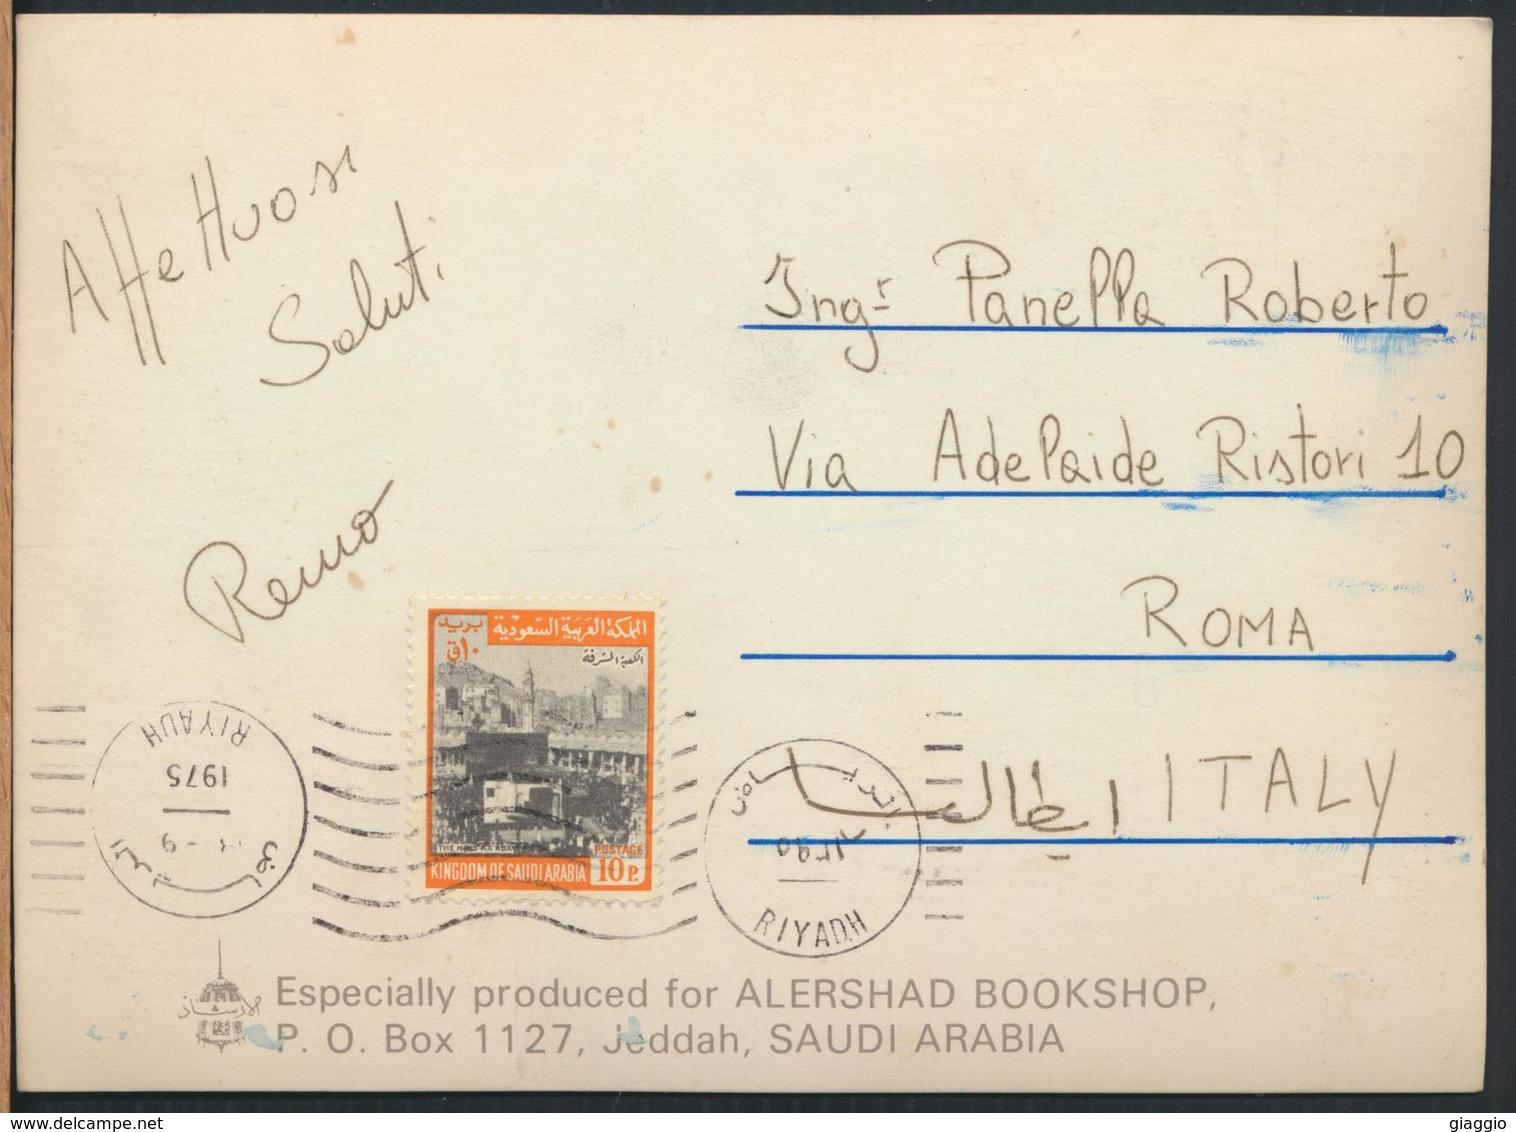 °°° 13069 - SAUDI ARABIA - JEDDAH THREE-DIMENSIONAL POSTCARD - 1975 With Stamps °°° - Arabia Saudita